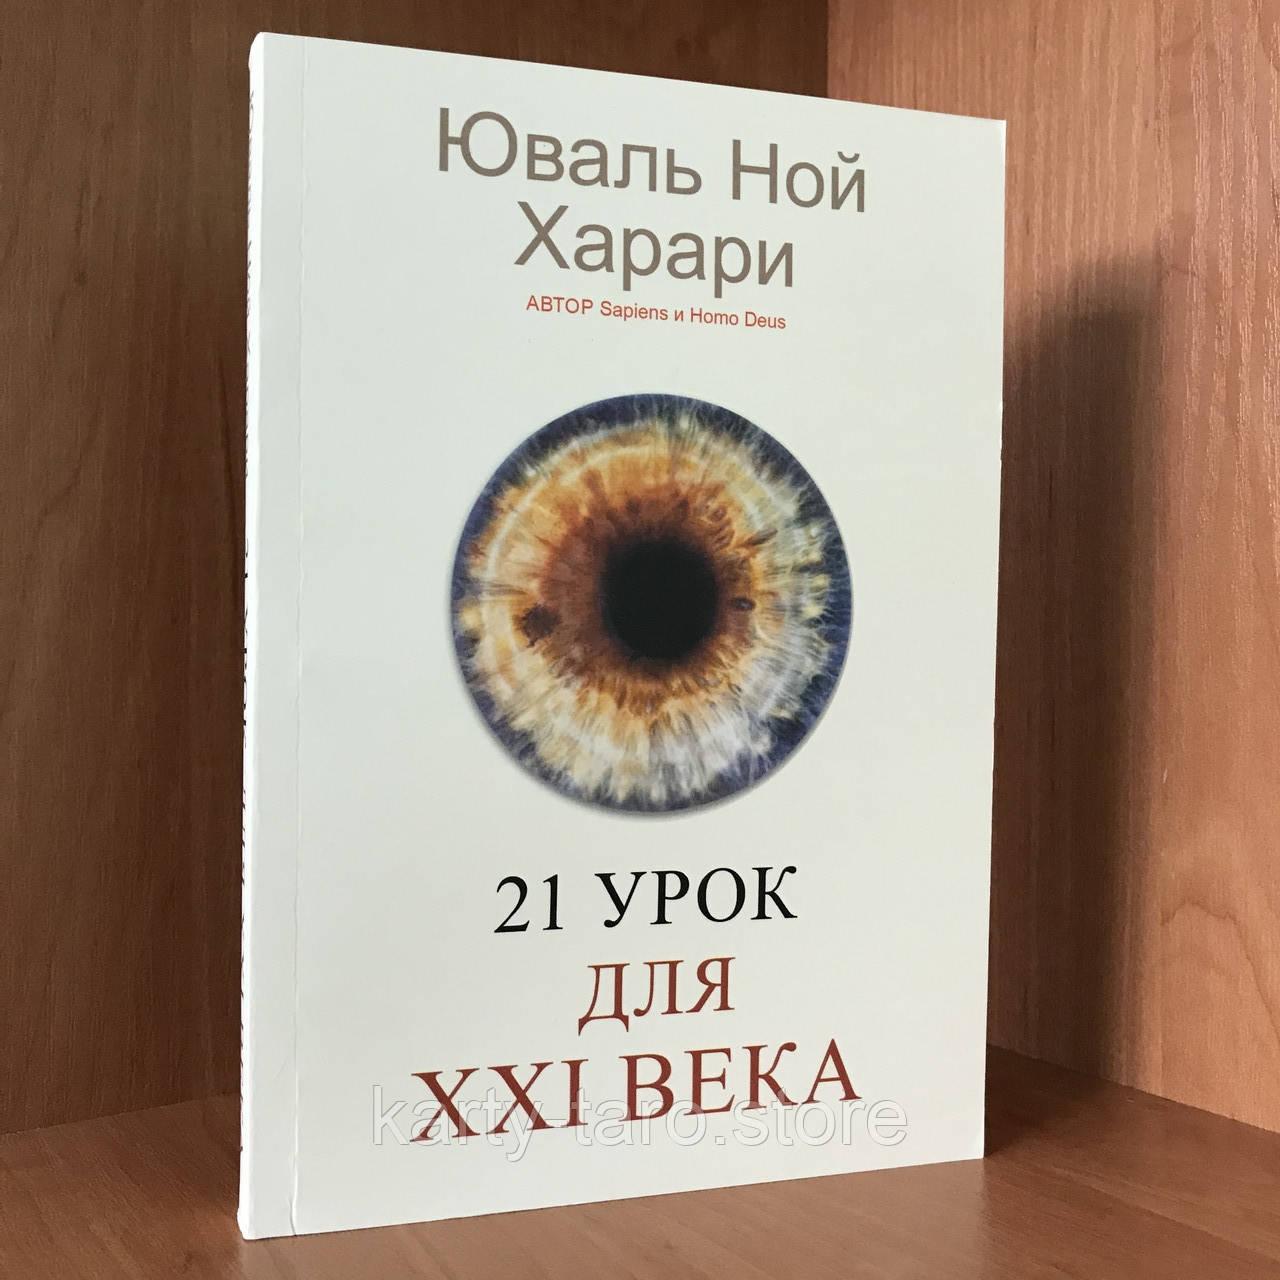 Книга 21 урок для XXI века - Юваль Ной Харари